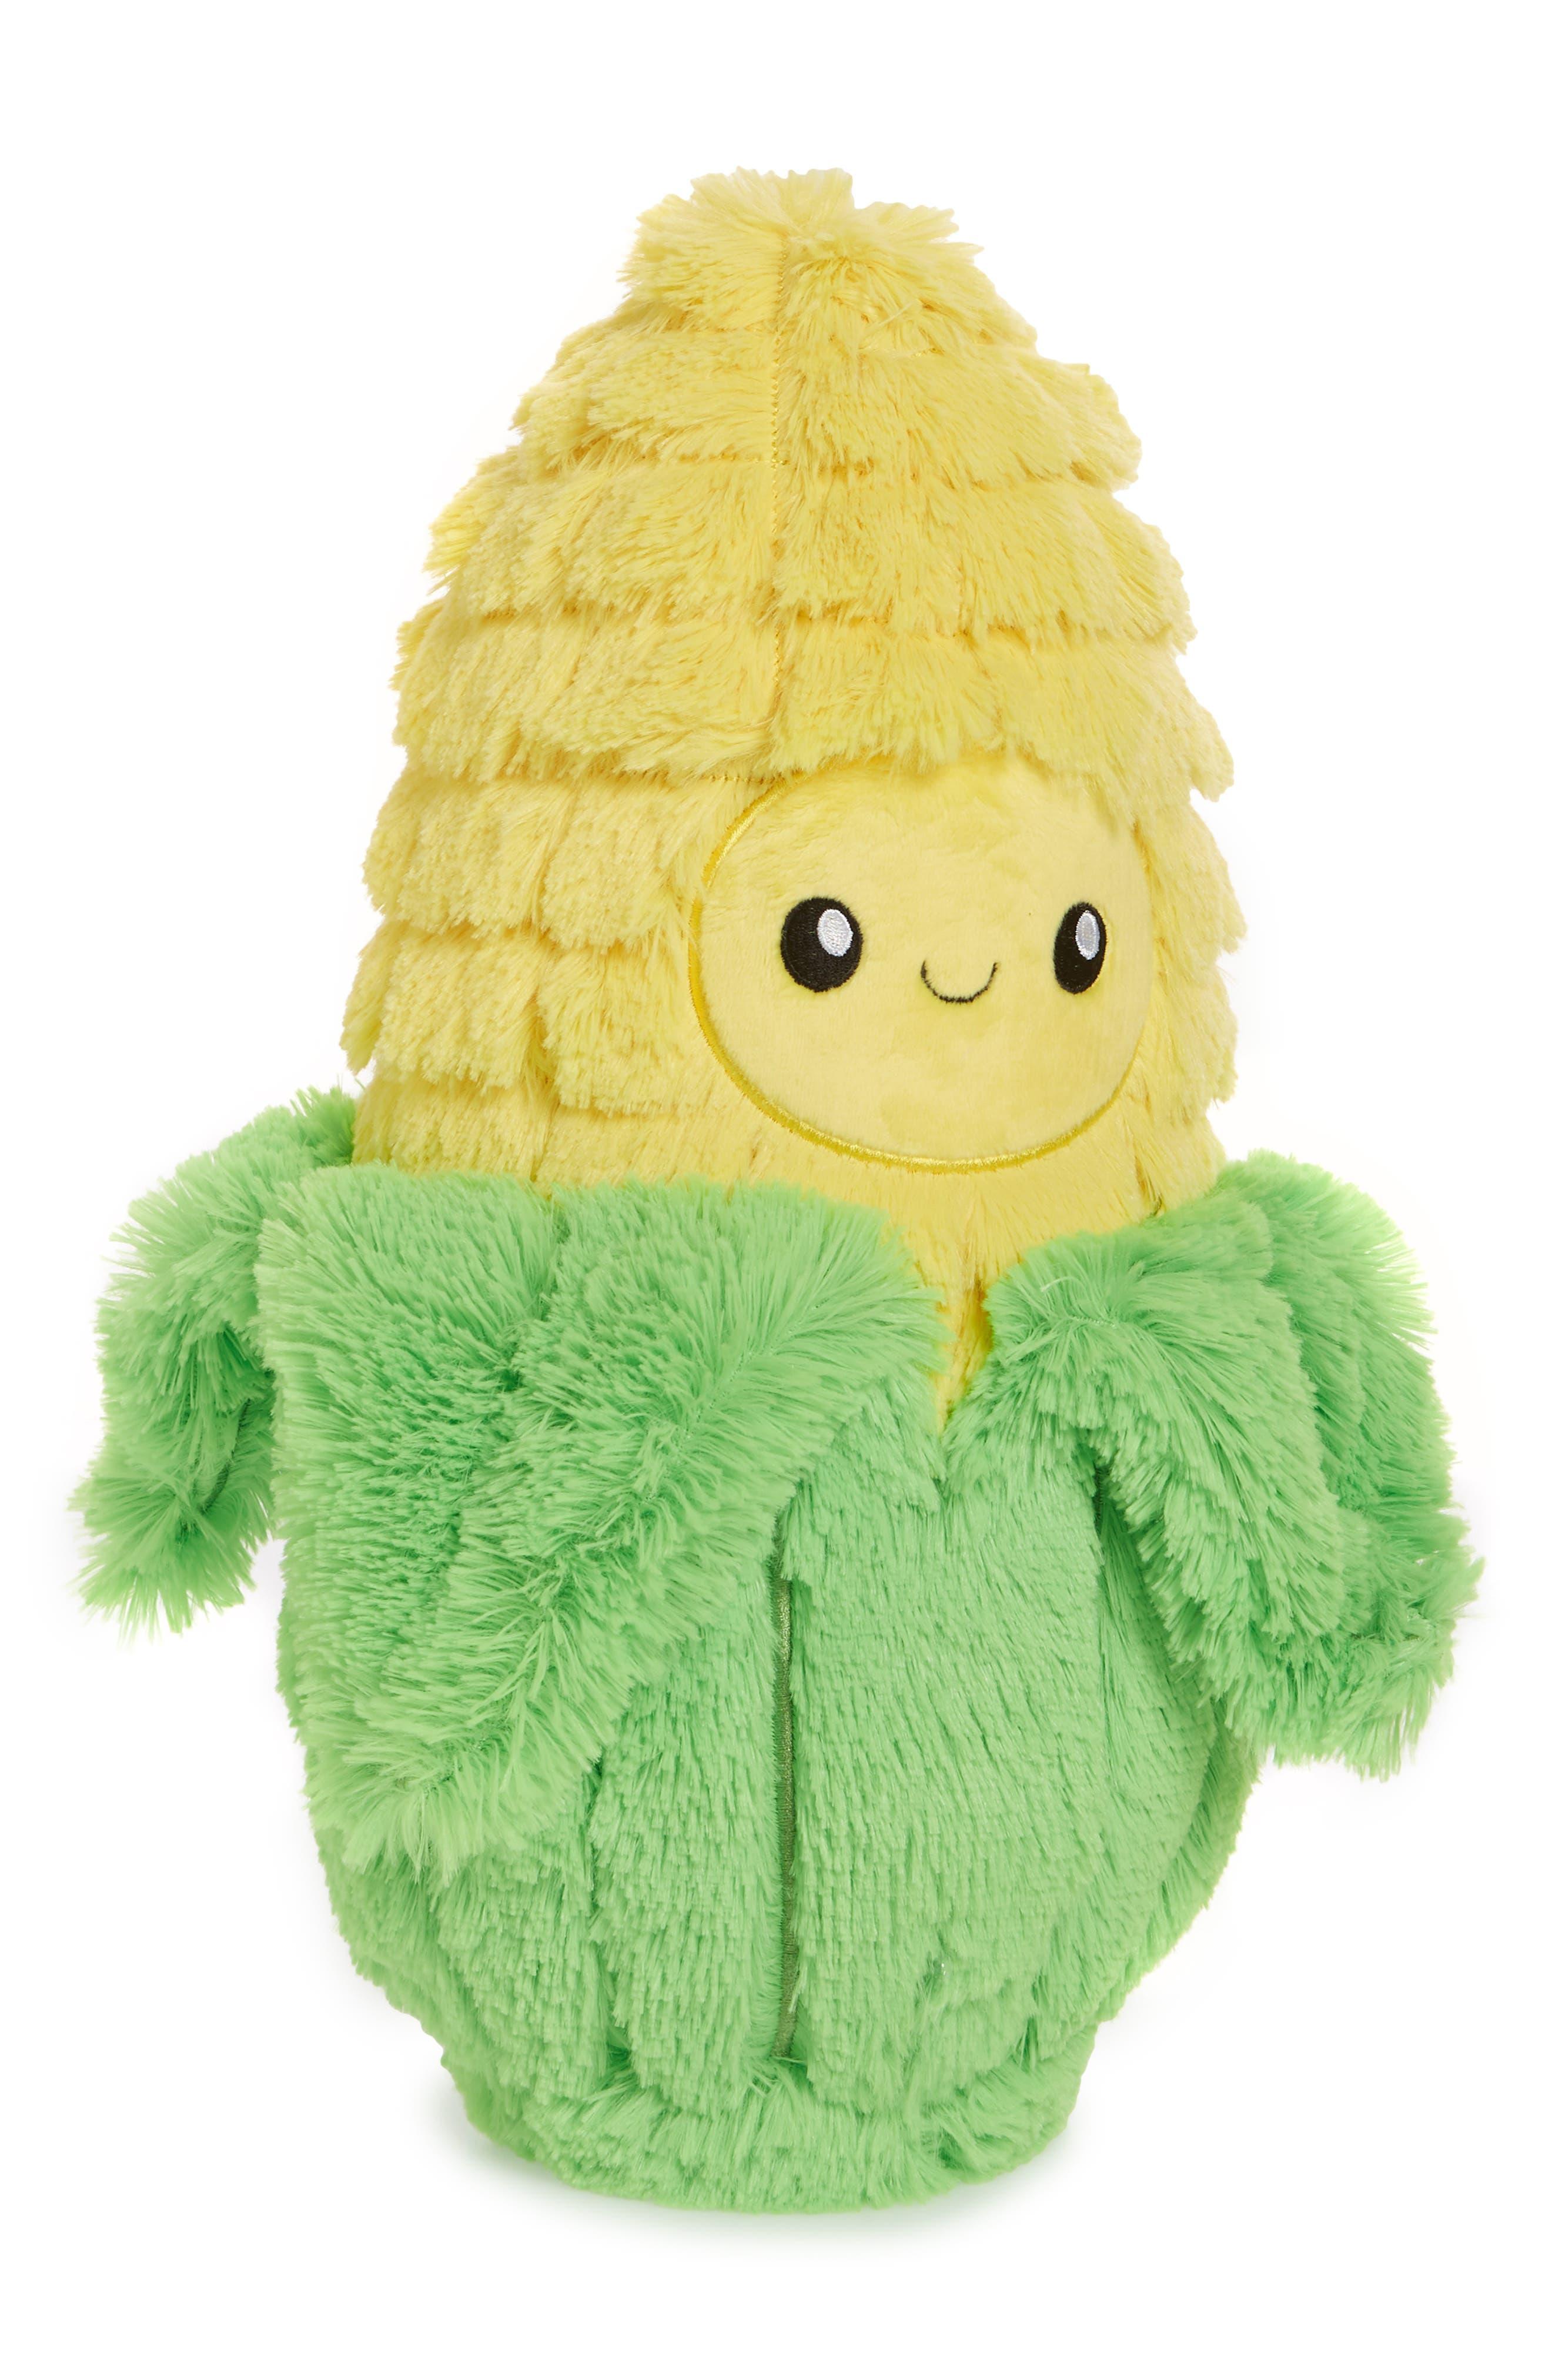 Squishable Corn Stuffed Toy